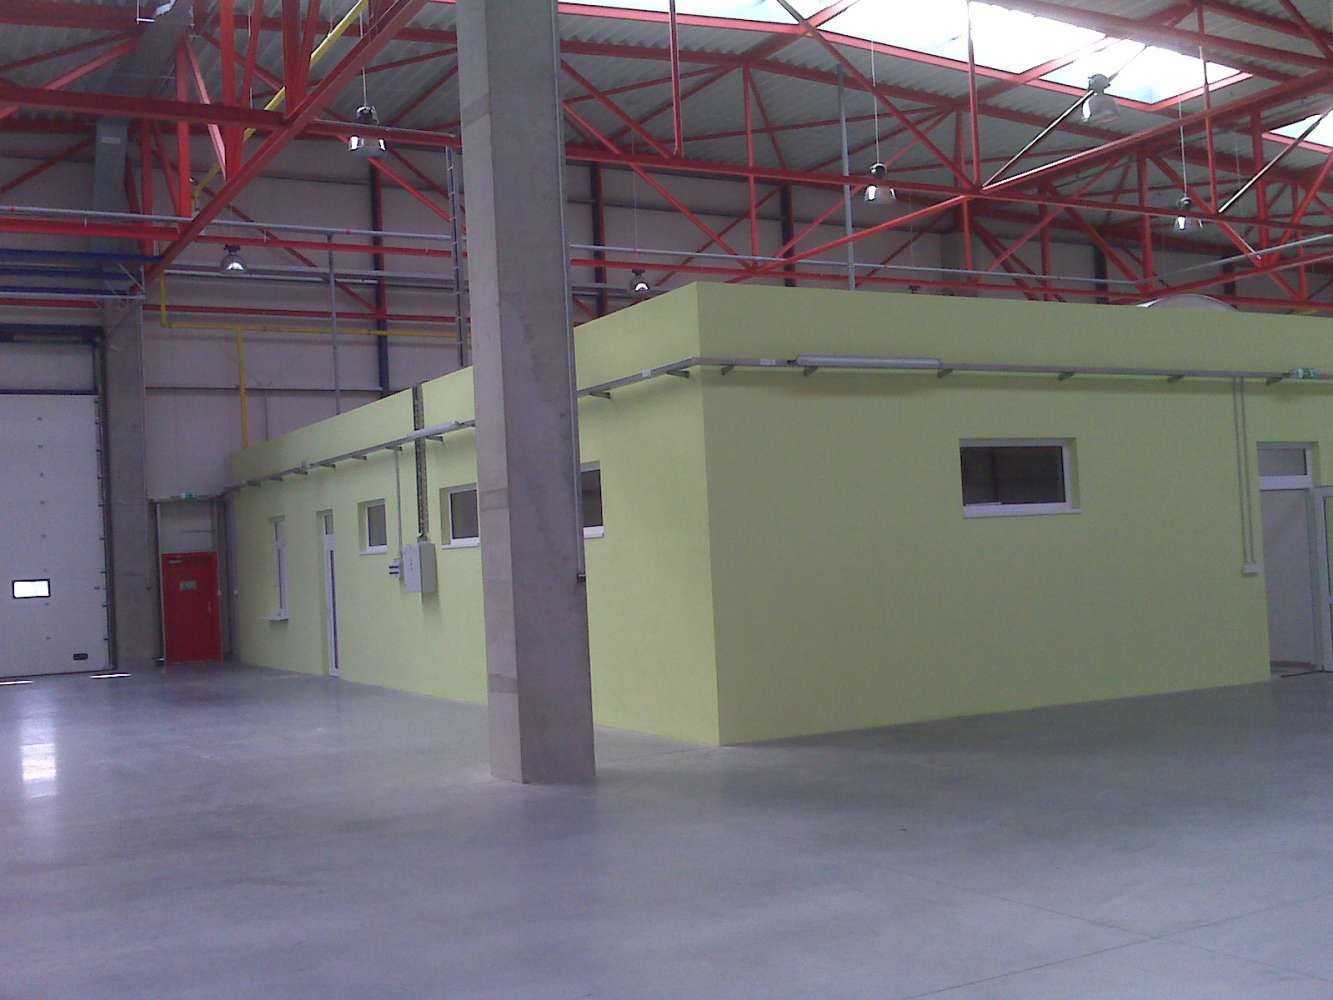 Průmyslové nemovitosti Mlada boleslav - bezdecin,  - UNO Park Mladá Boleslav - Bezděčín - 255089217630160